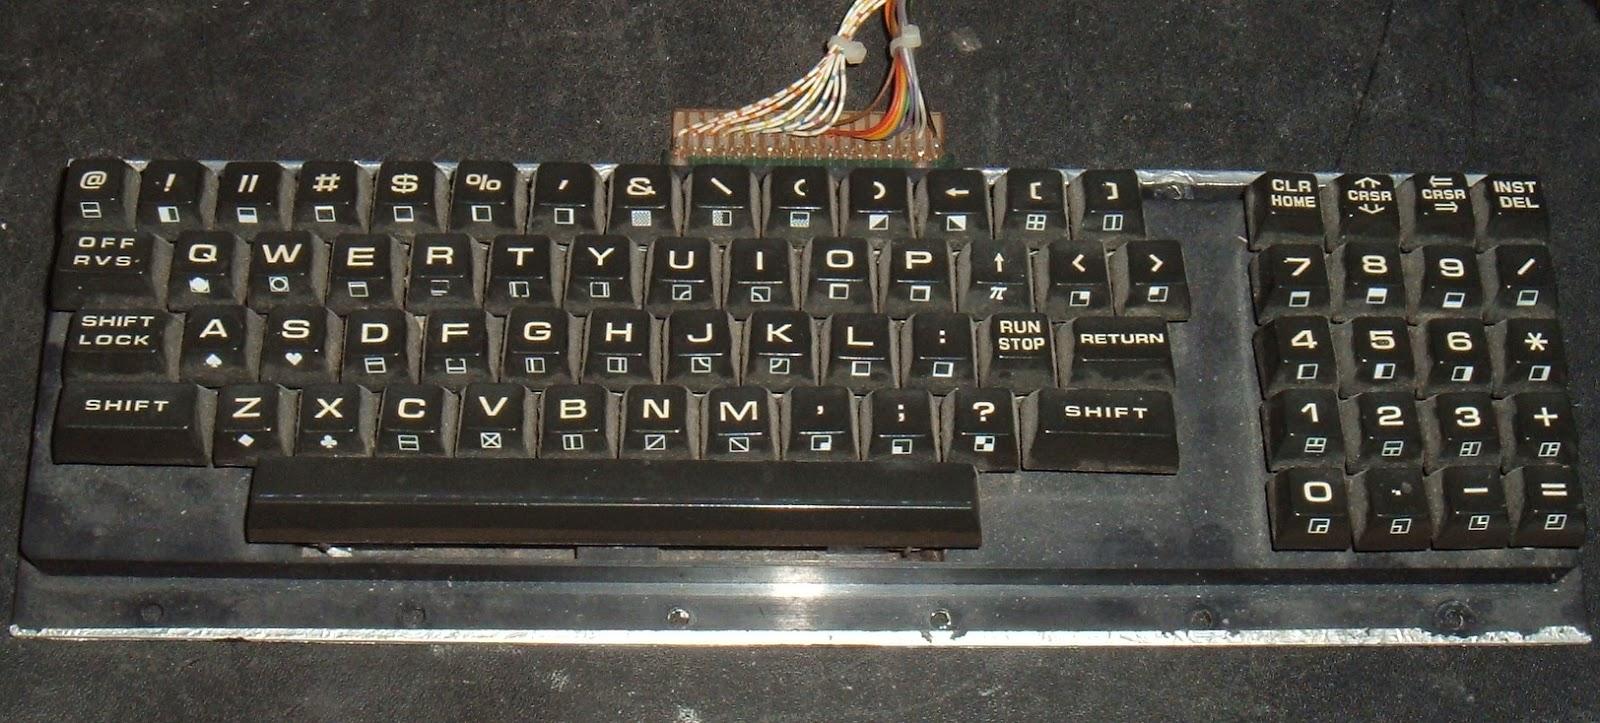 Tynemouth Software: Commodore Pet Repair Part 3 - Power